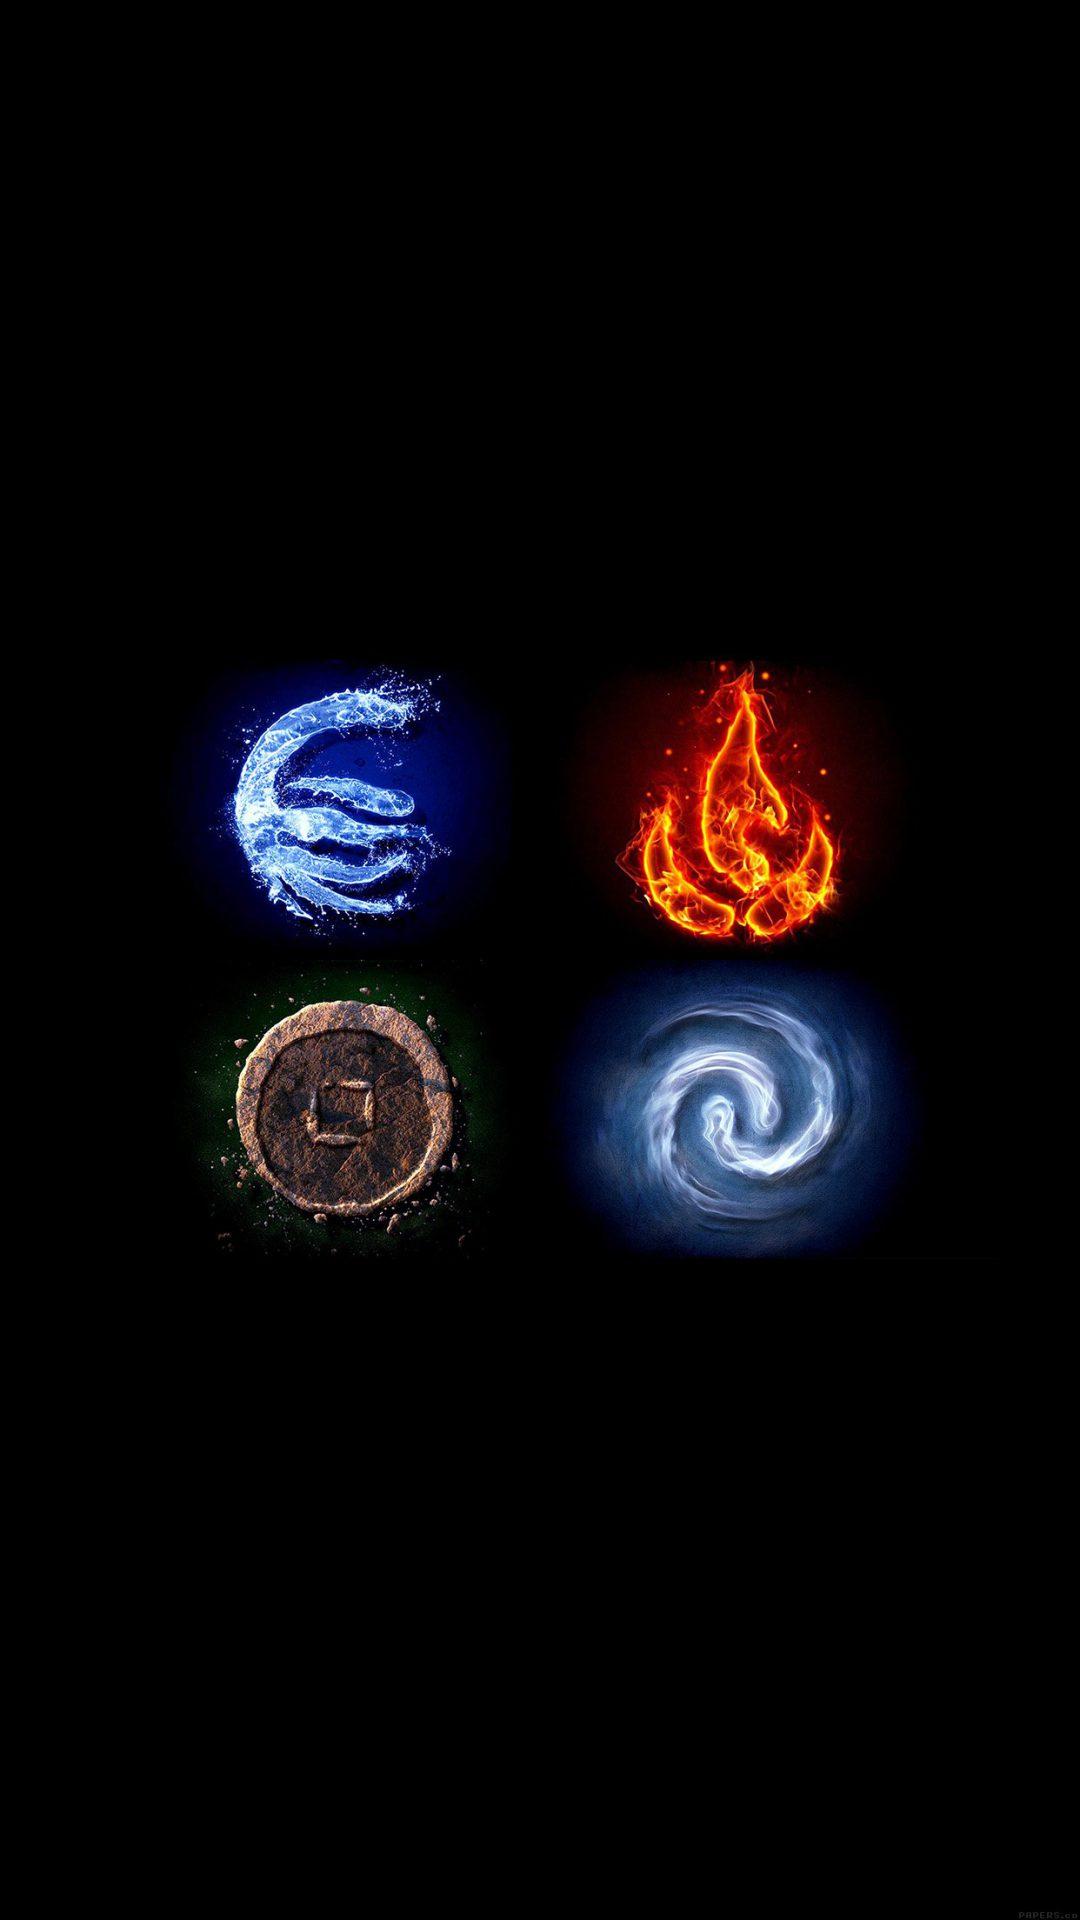 Avatar The Last Airbender Simbol Anime